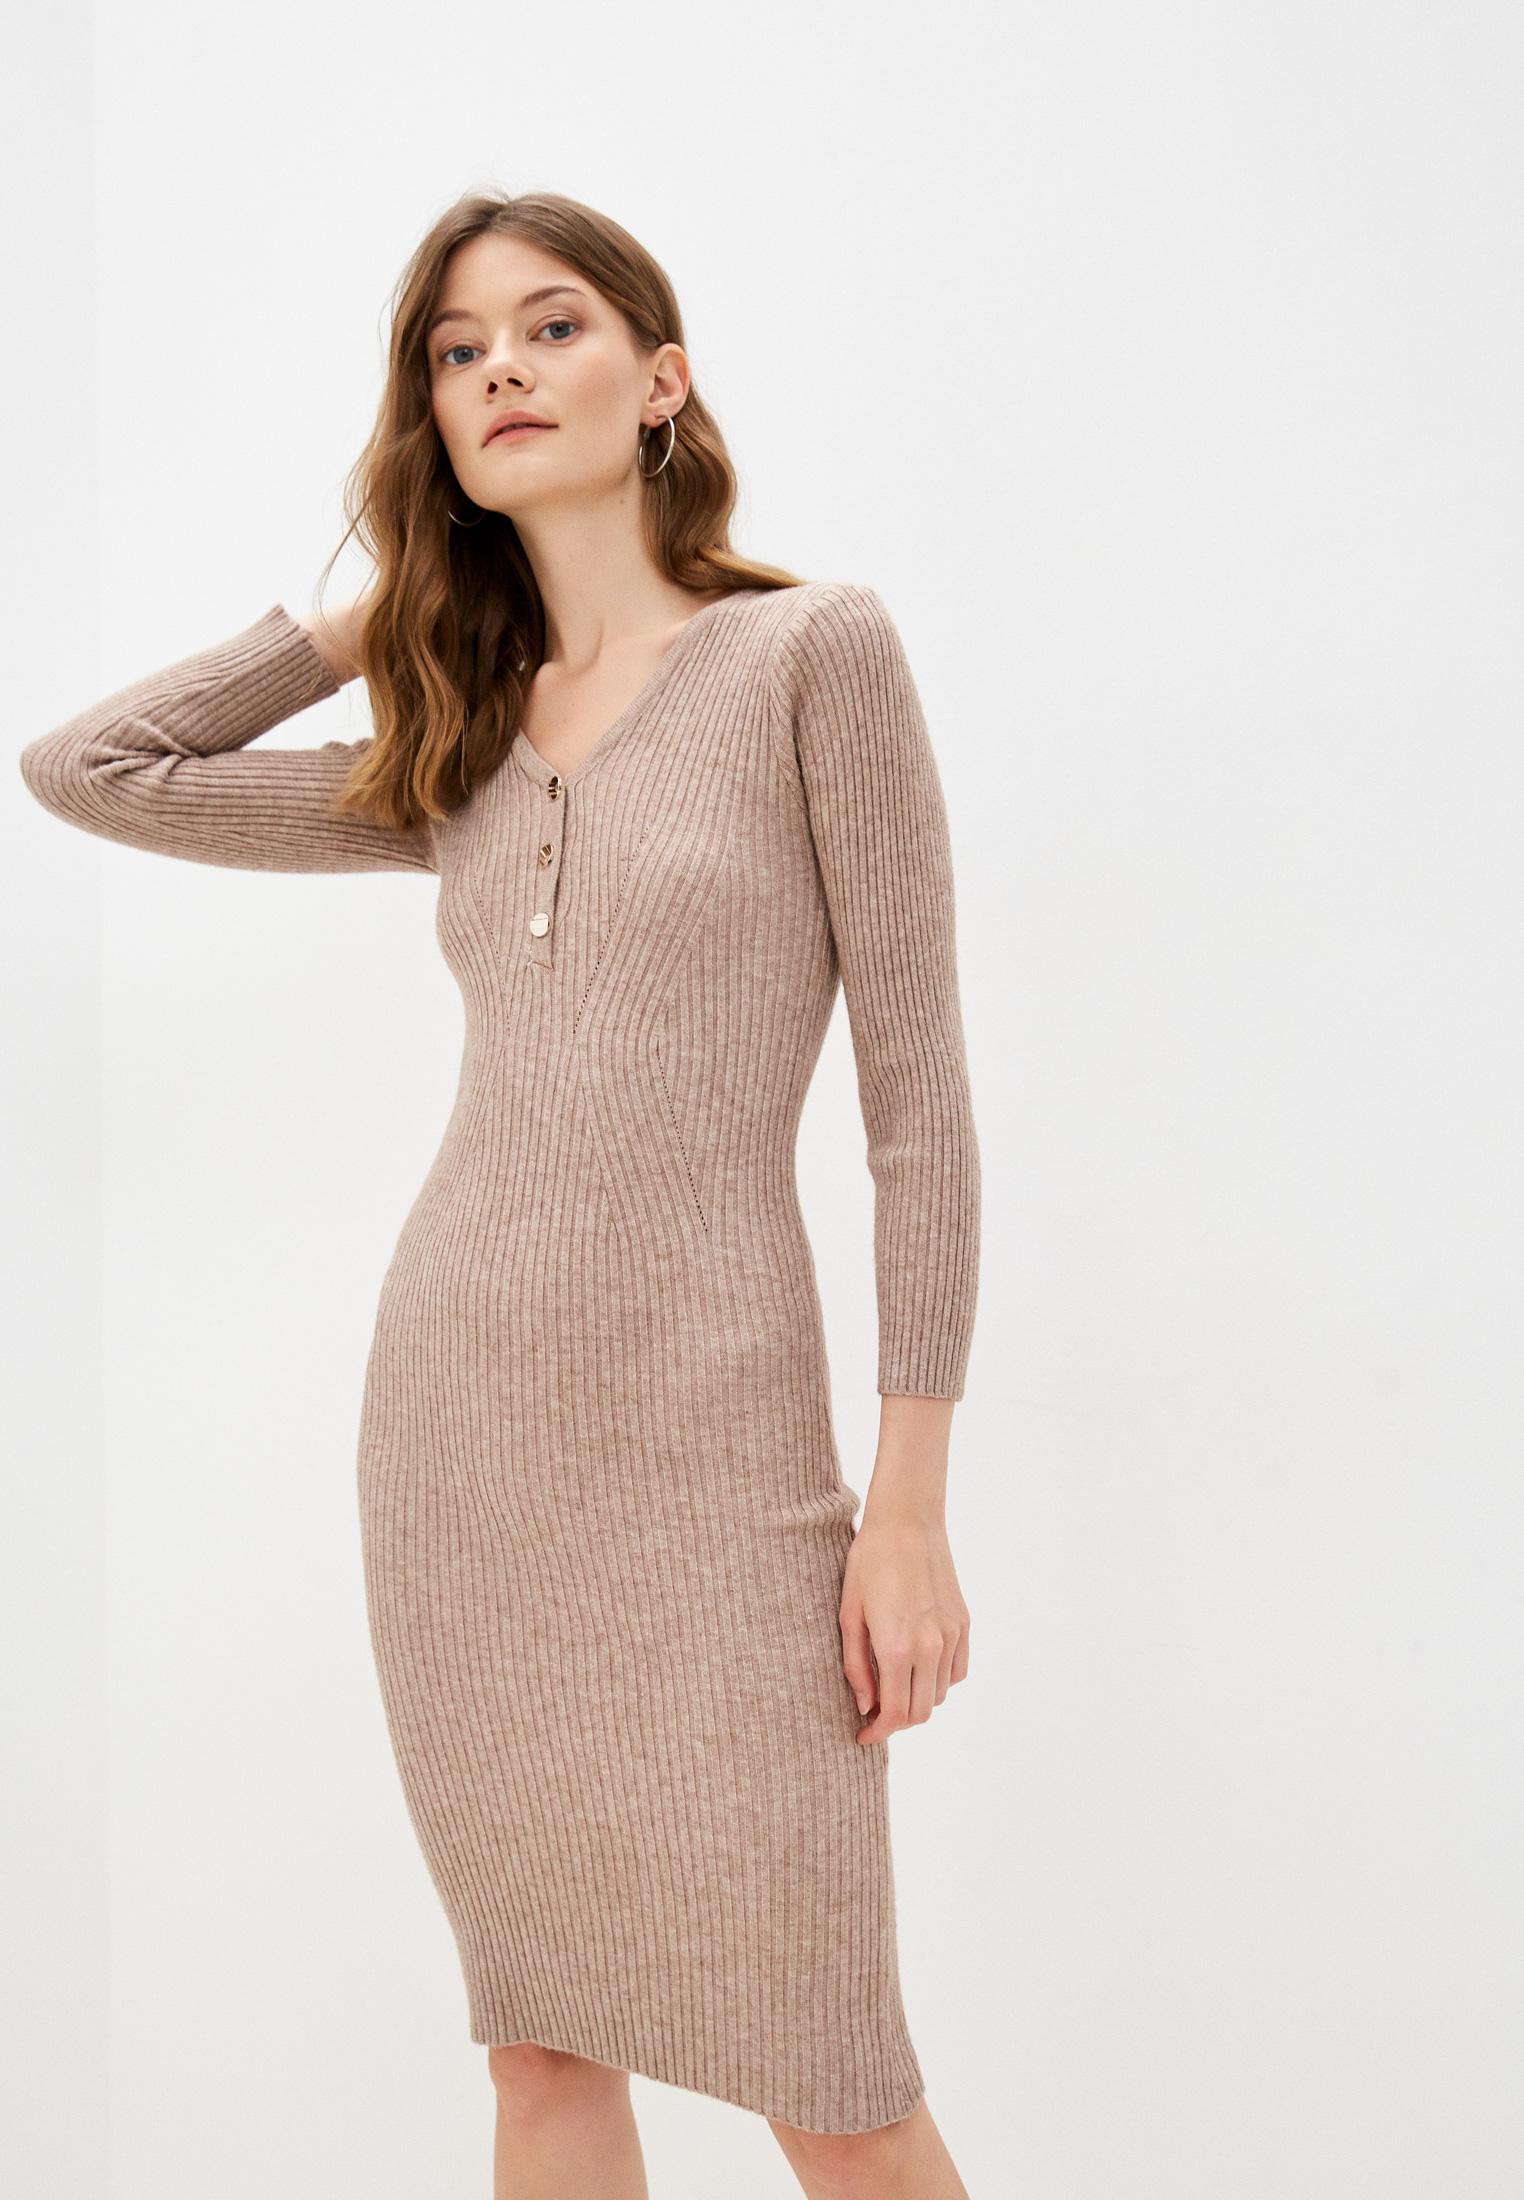 Вязаное платье Vickwool VW260-3